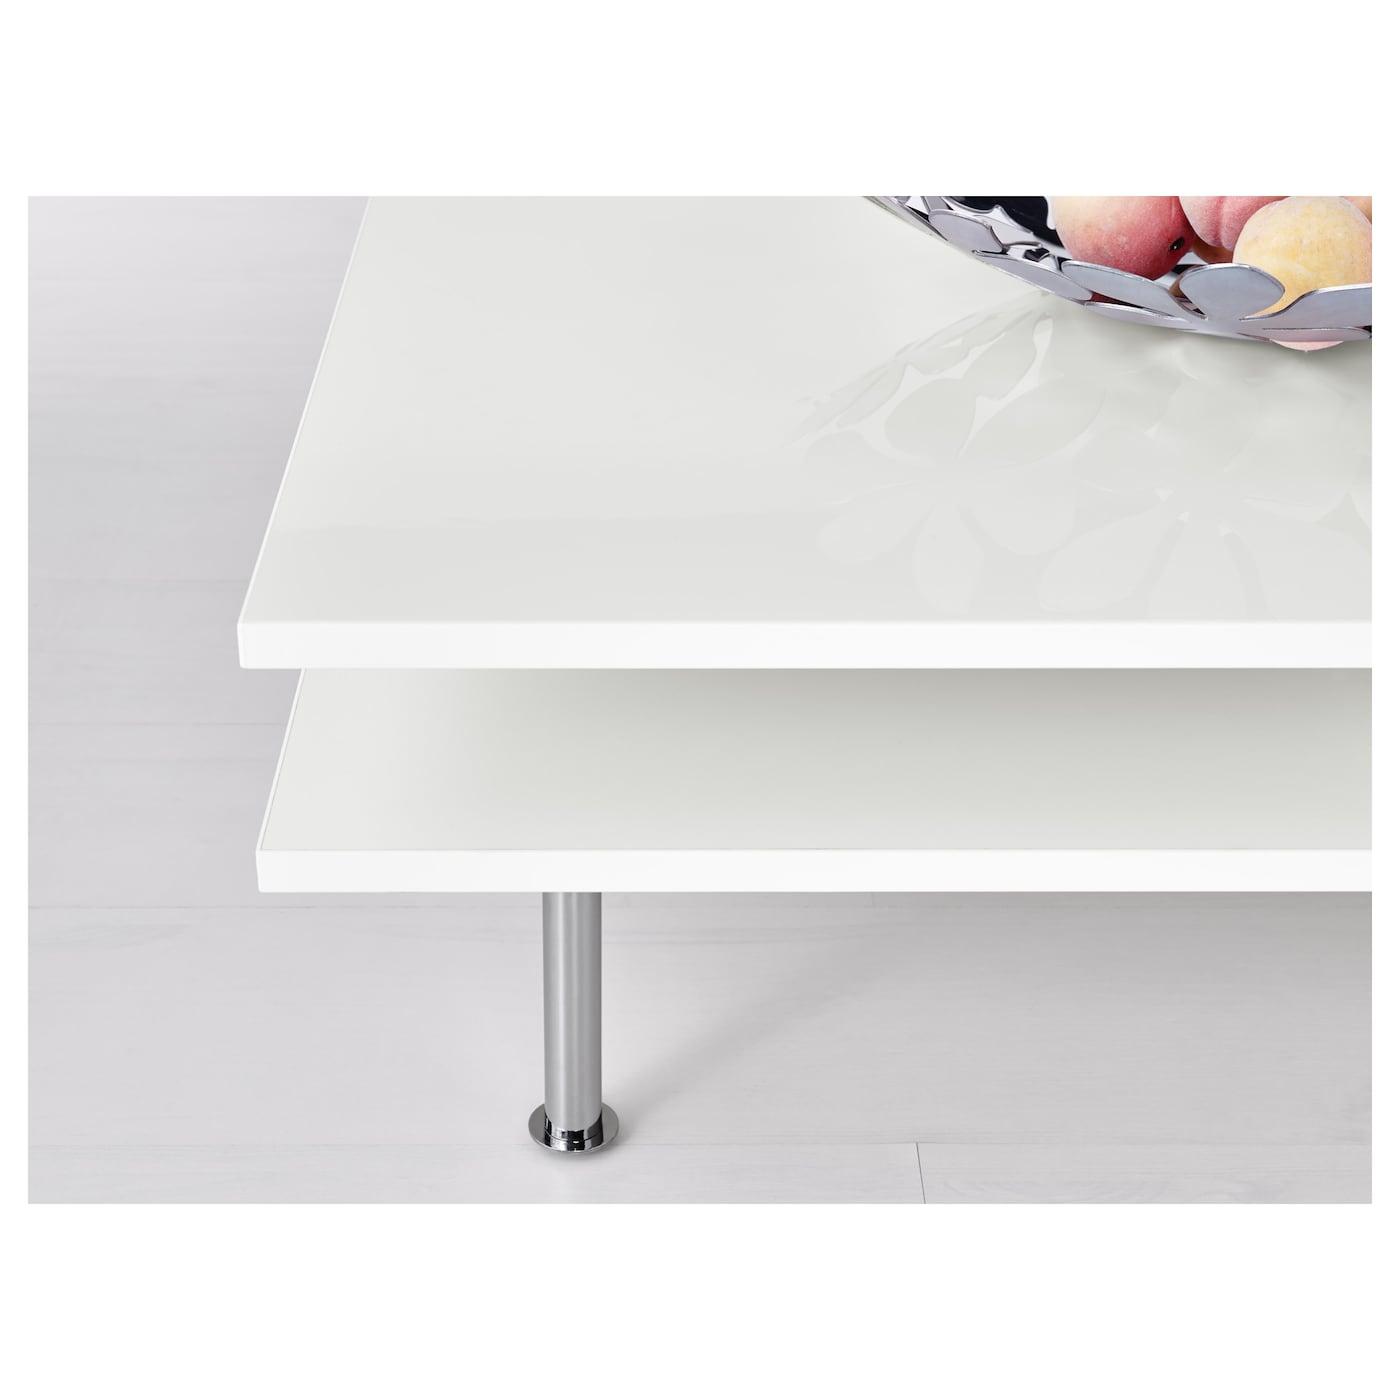 tofteryd table basse brillant blanc 95 x 95 cm ikea. Black Bedroom Furniture Sets. Home Design Ideas